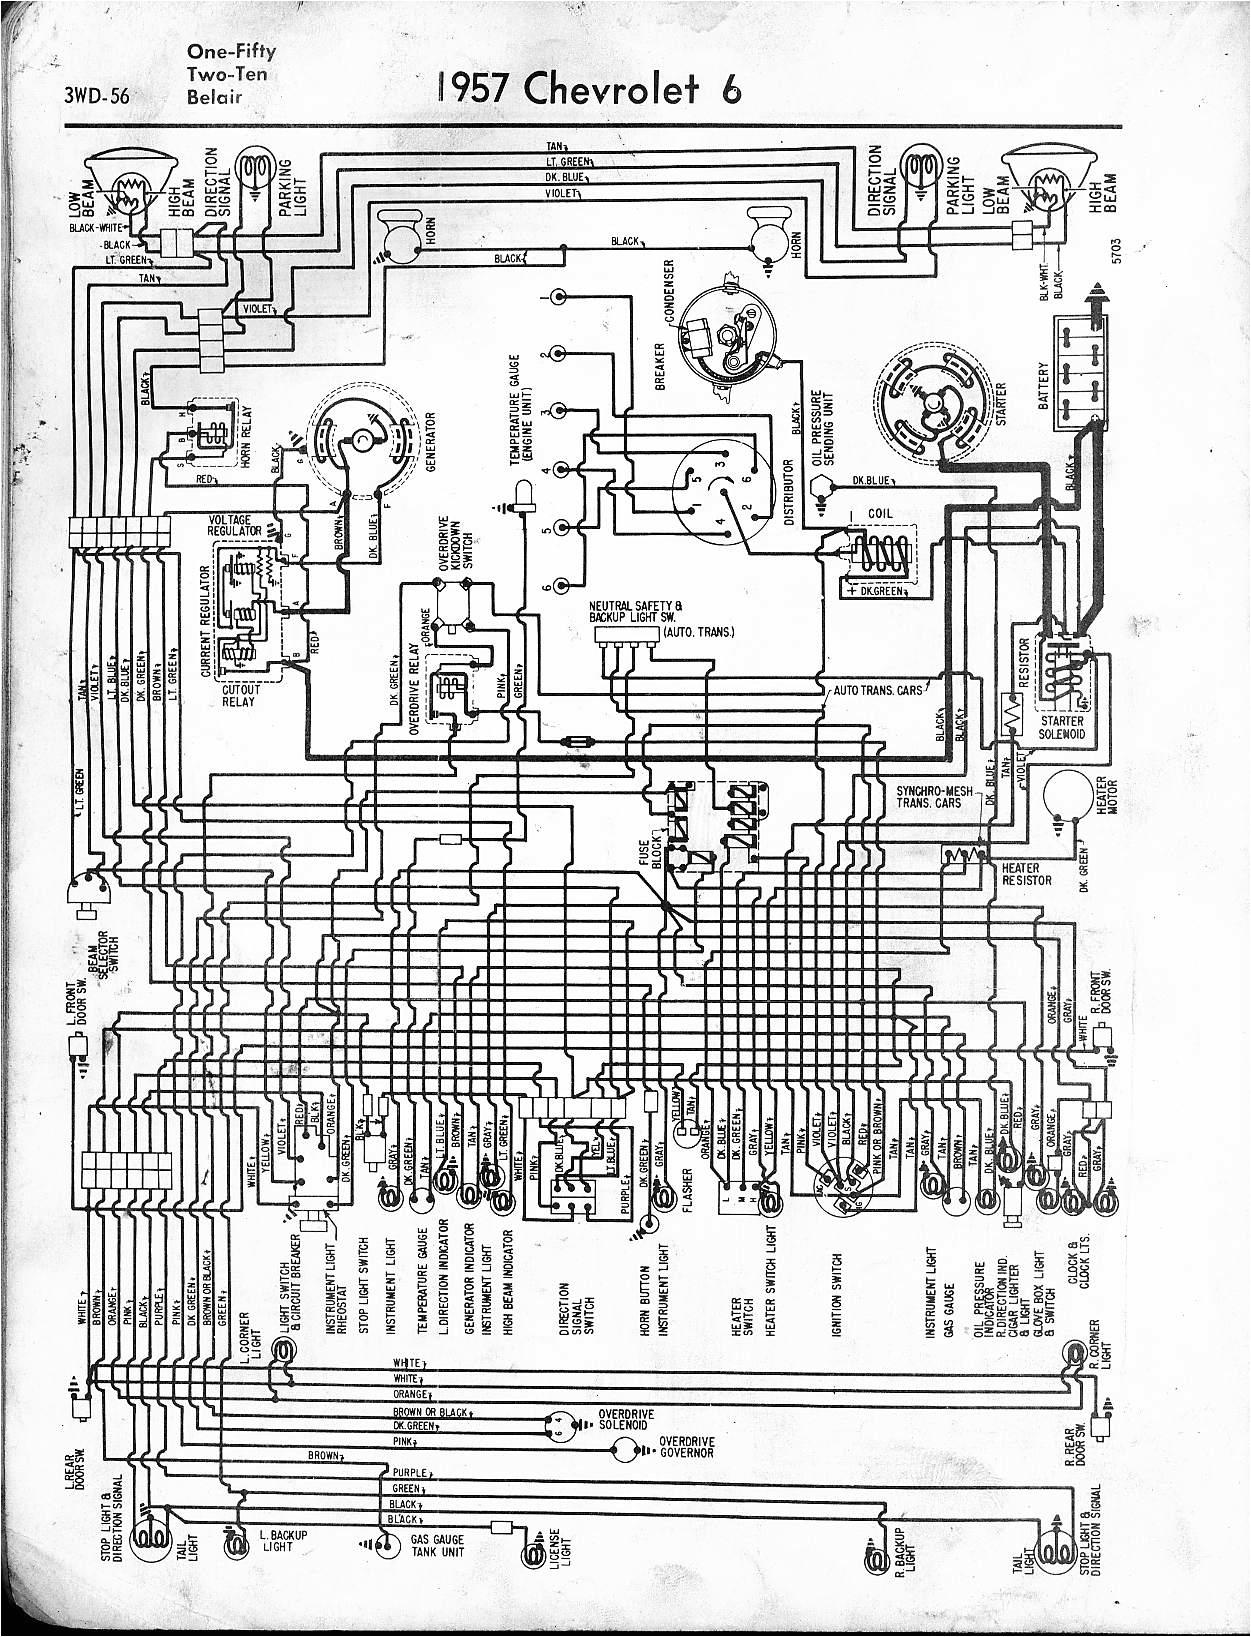 1962 chevy 2 ton wiring diagram wiring diagrams konsult